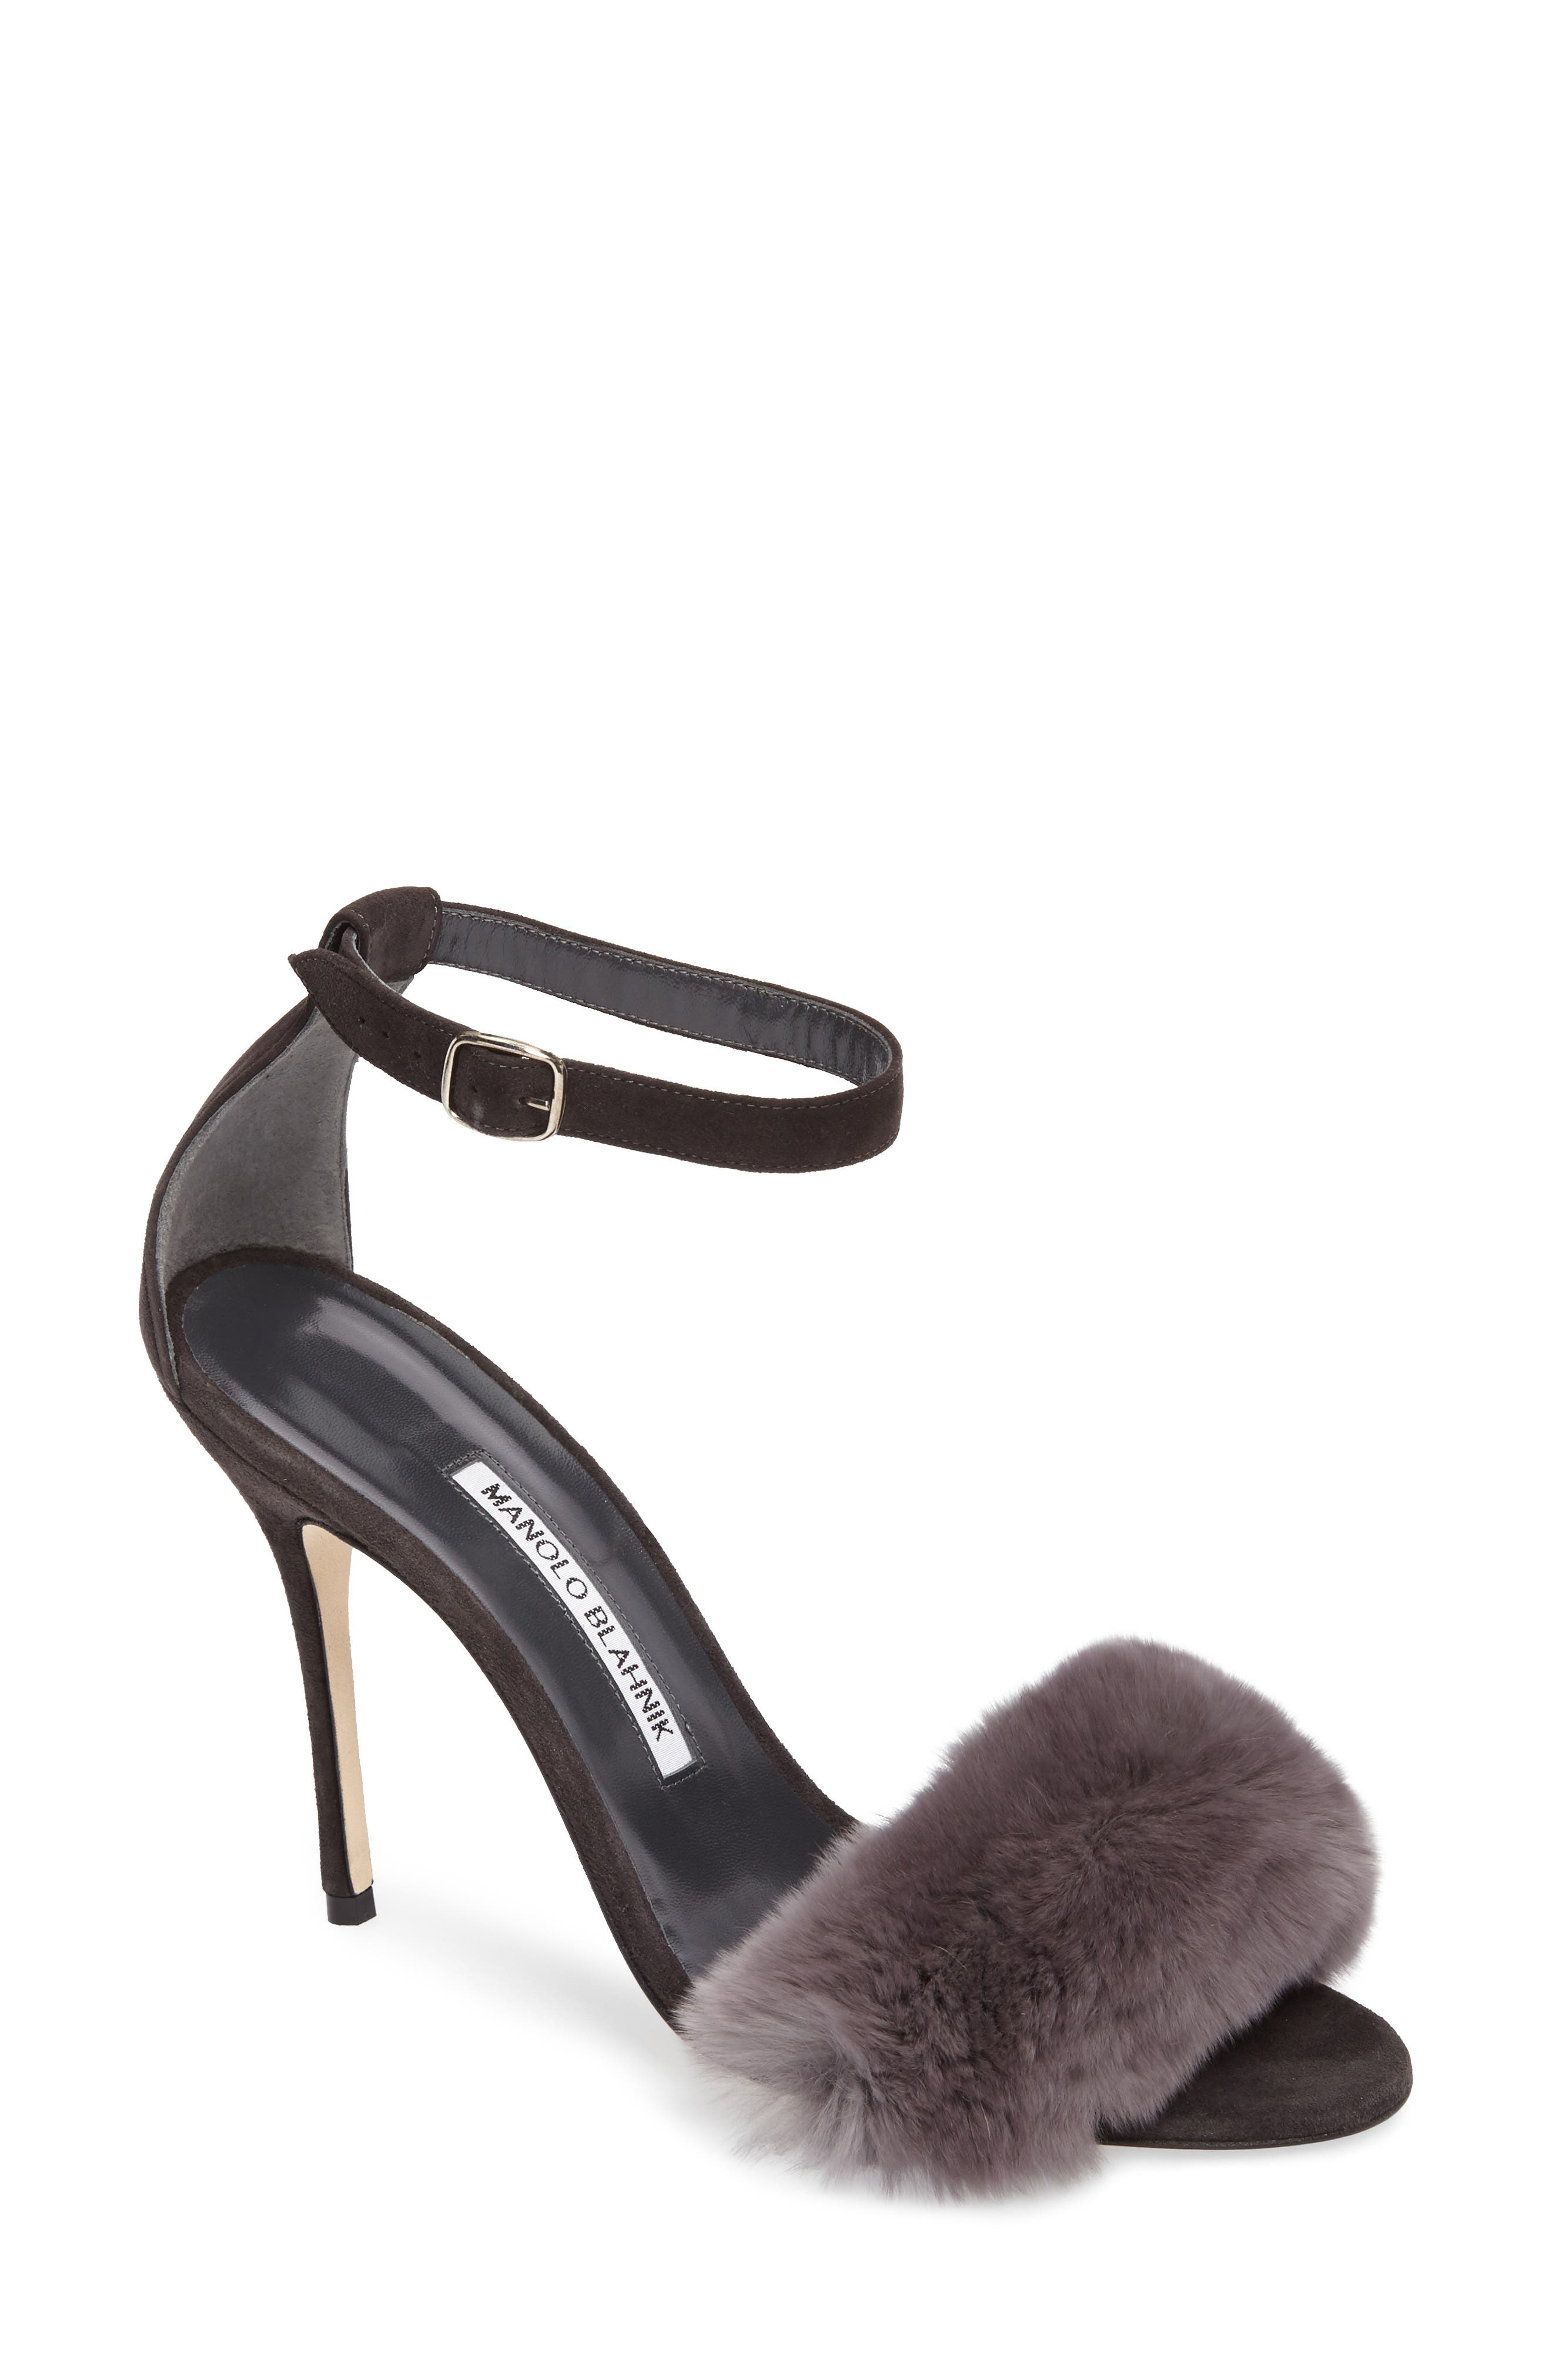 Mincha Genuine Rabbit Fur Sandal,                             Main thumbnail 1, color,                             035